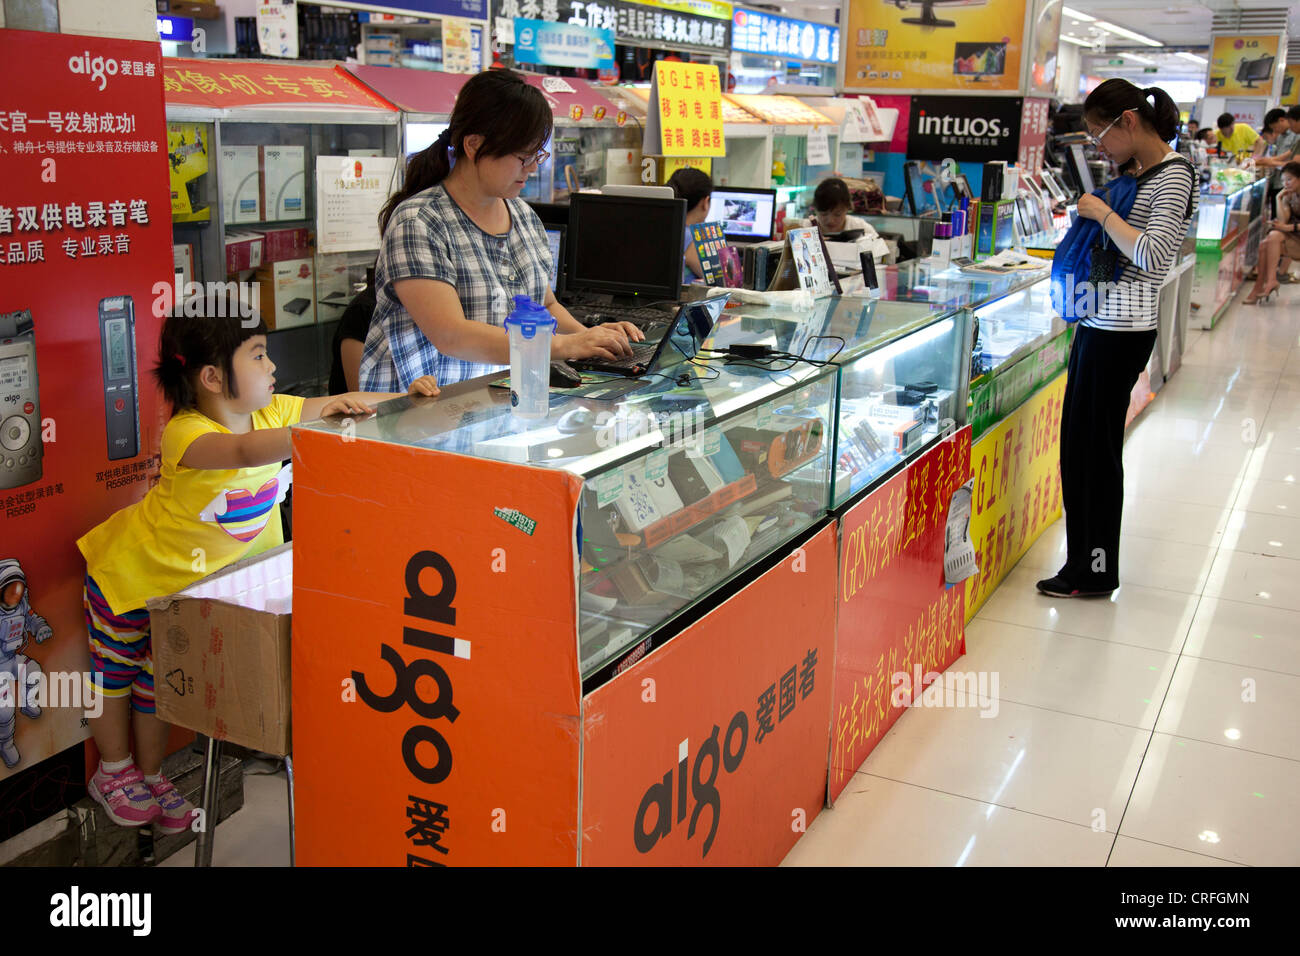 2 pc 2 pc MJE15034 MJE15034G Avoid China Seller =junk /& fake